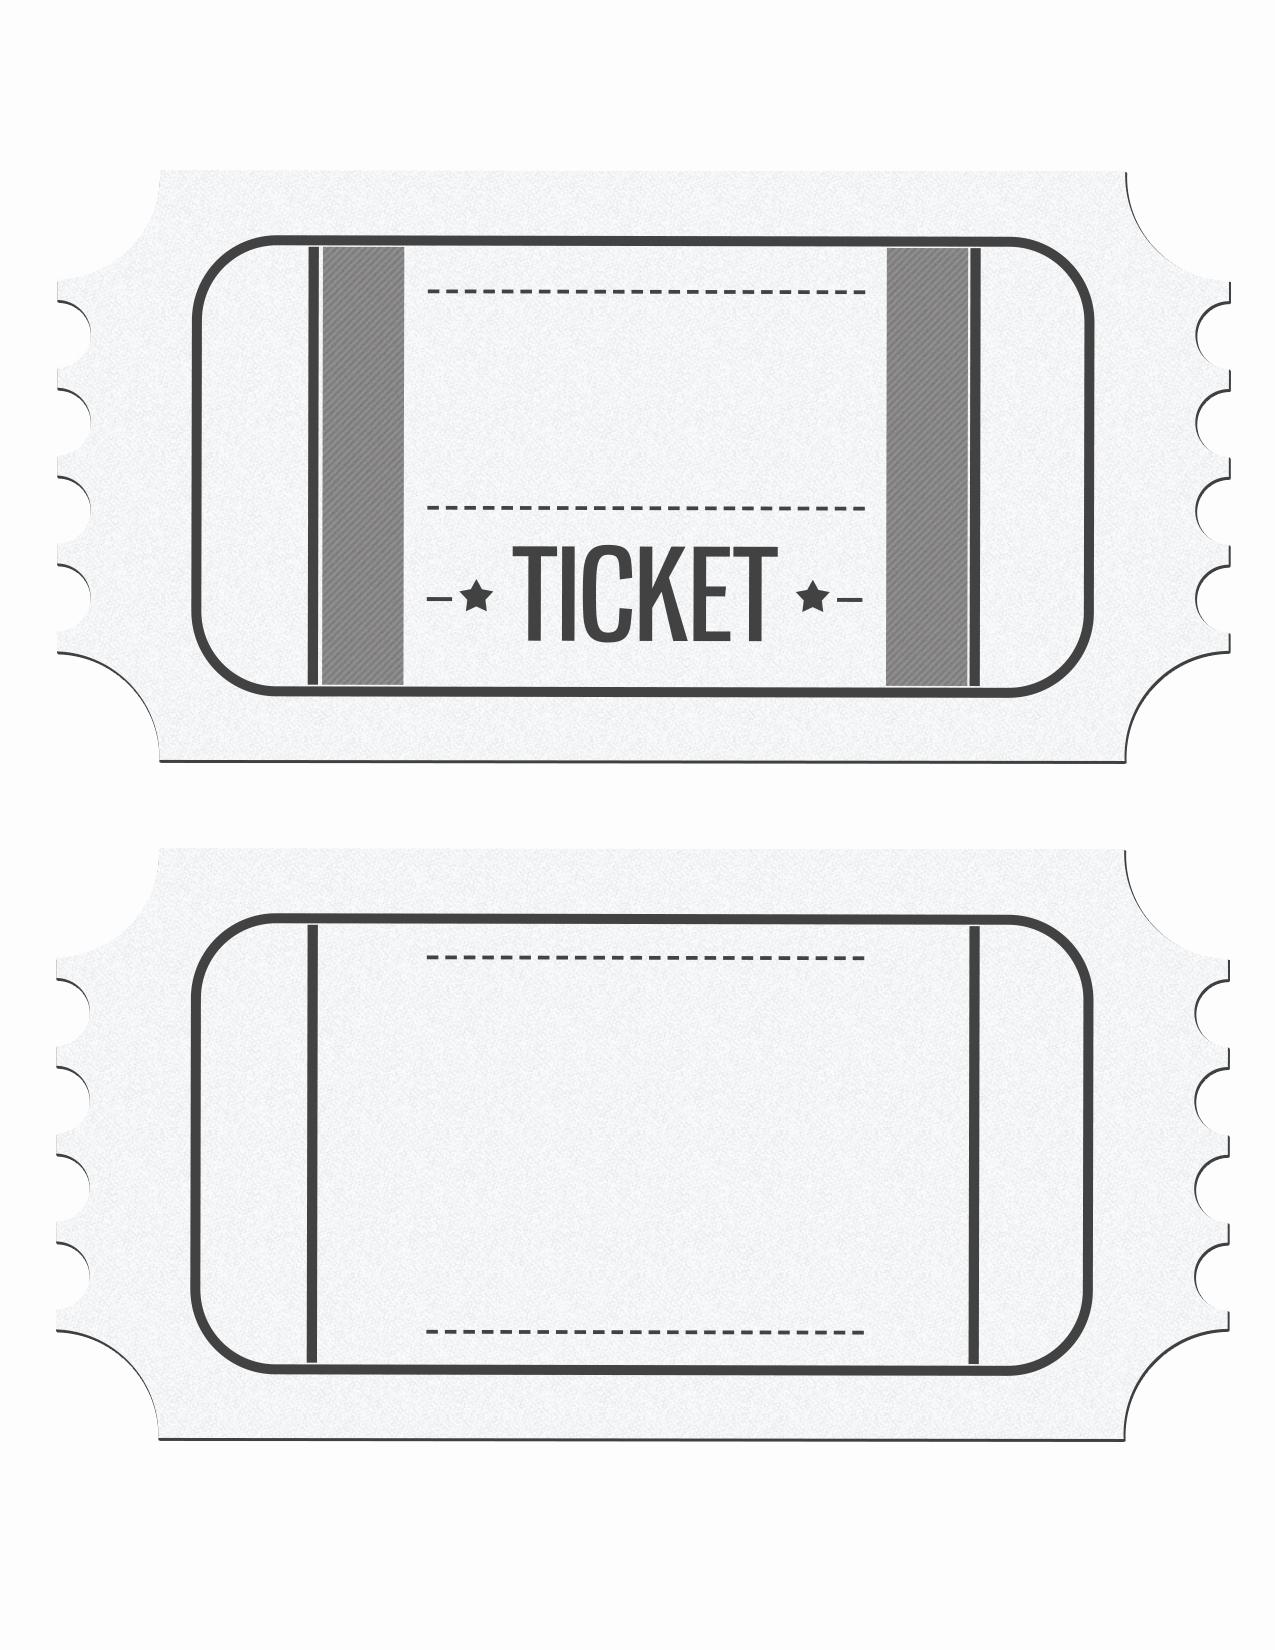 Movie Ticket Invitation Template New Blank Movie Ticket Invitation Template